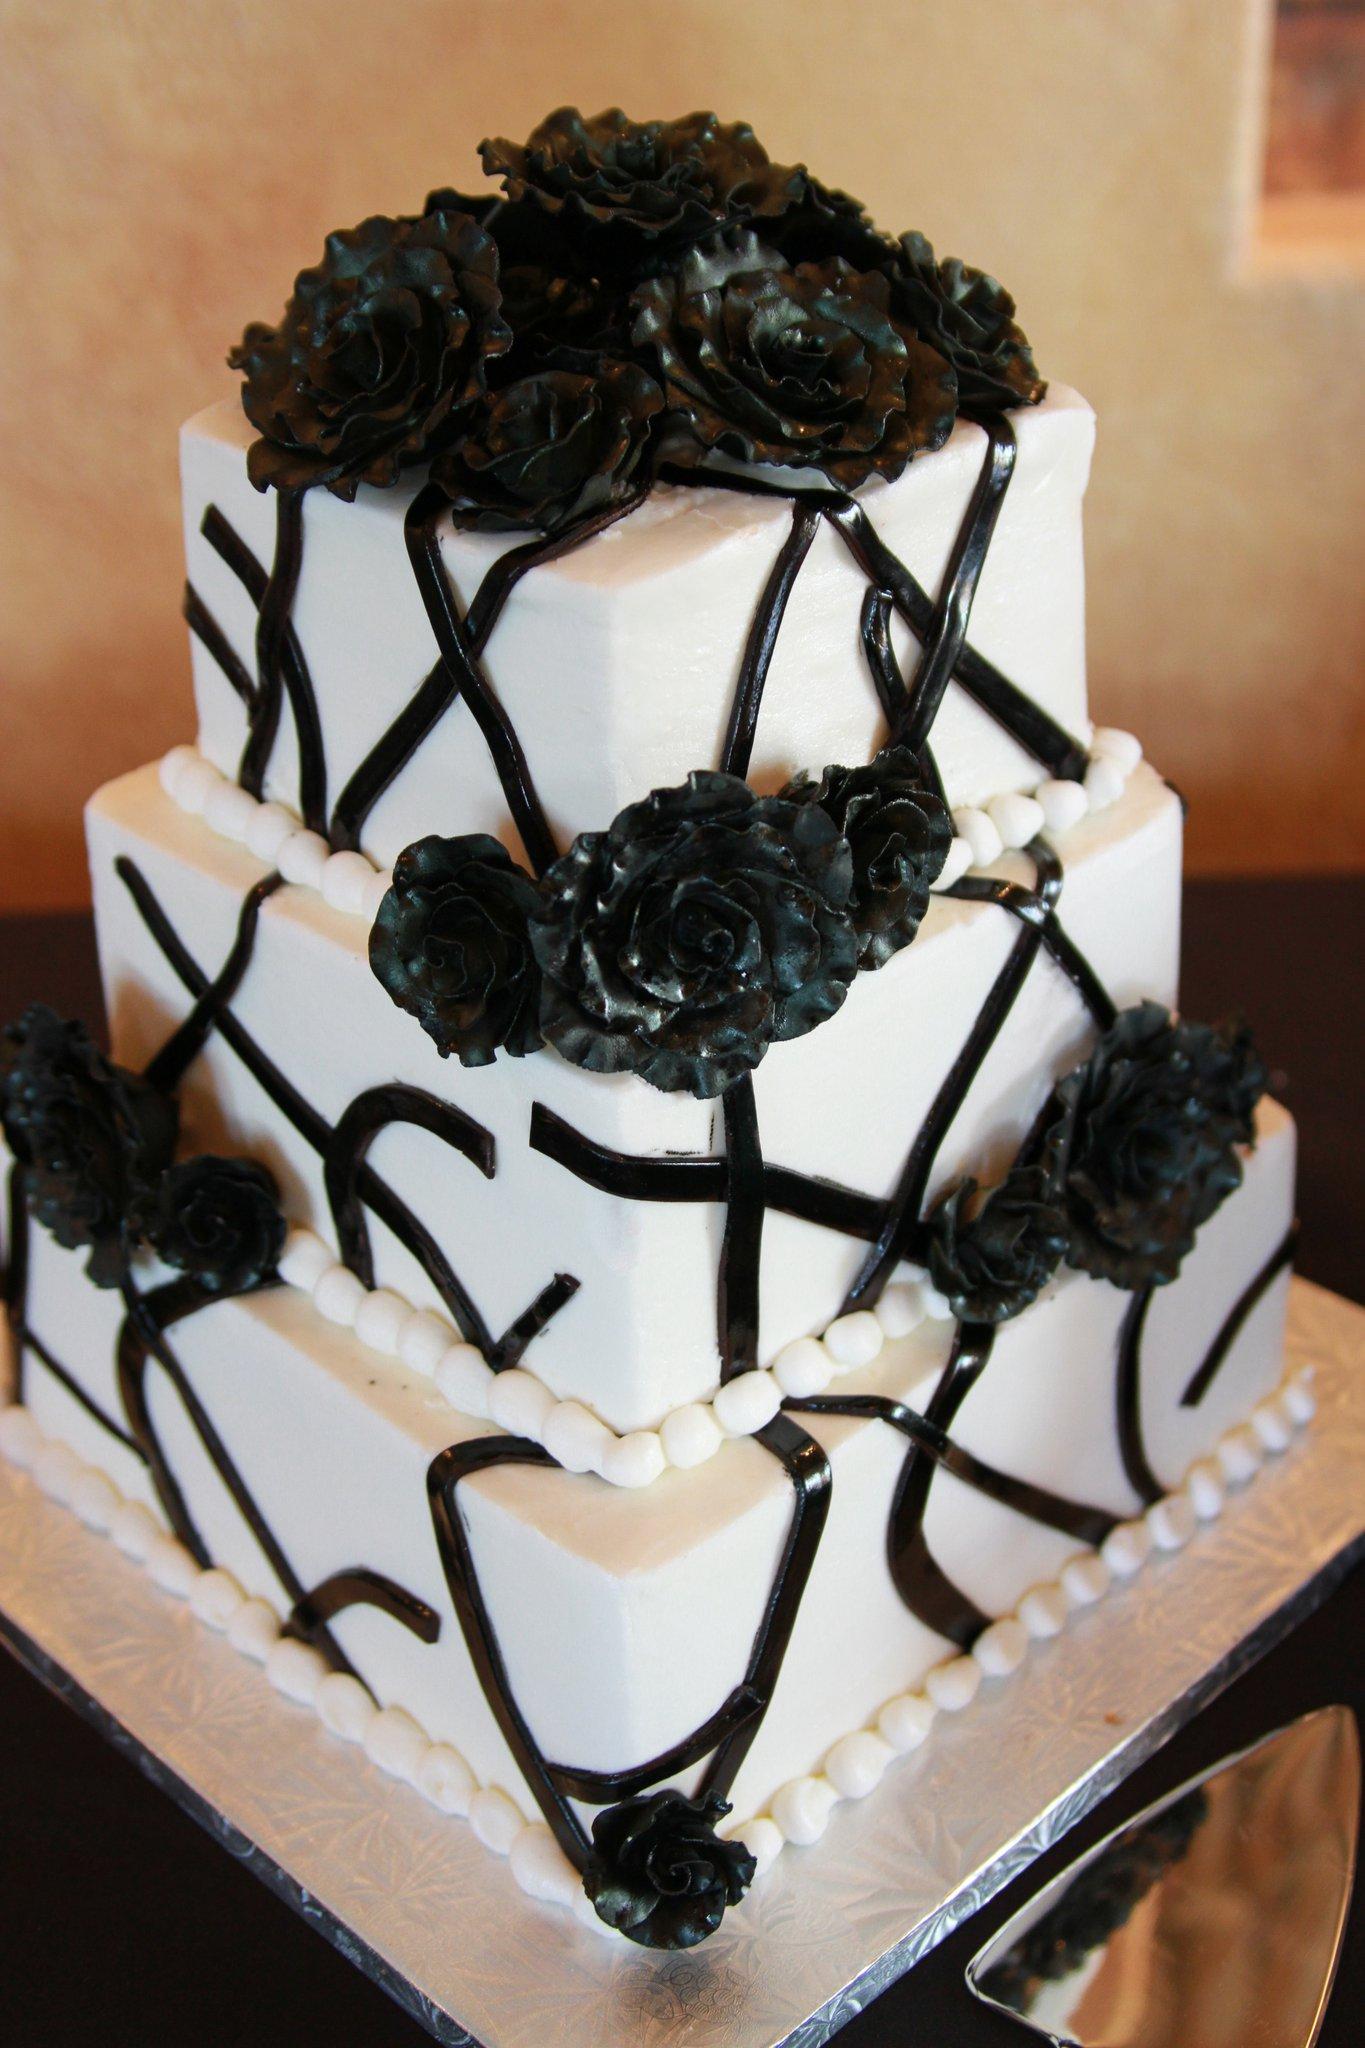 My black and white wedding cake (yes, those are black roses) :-)